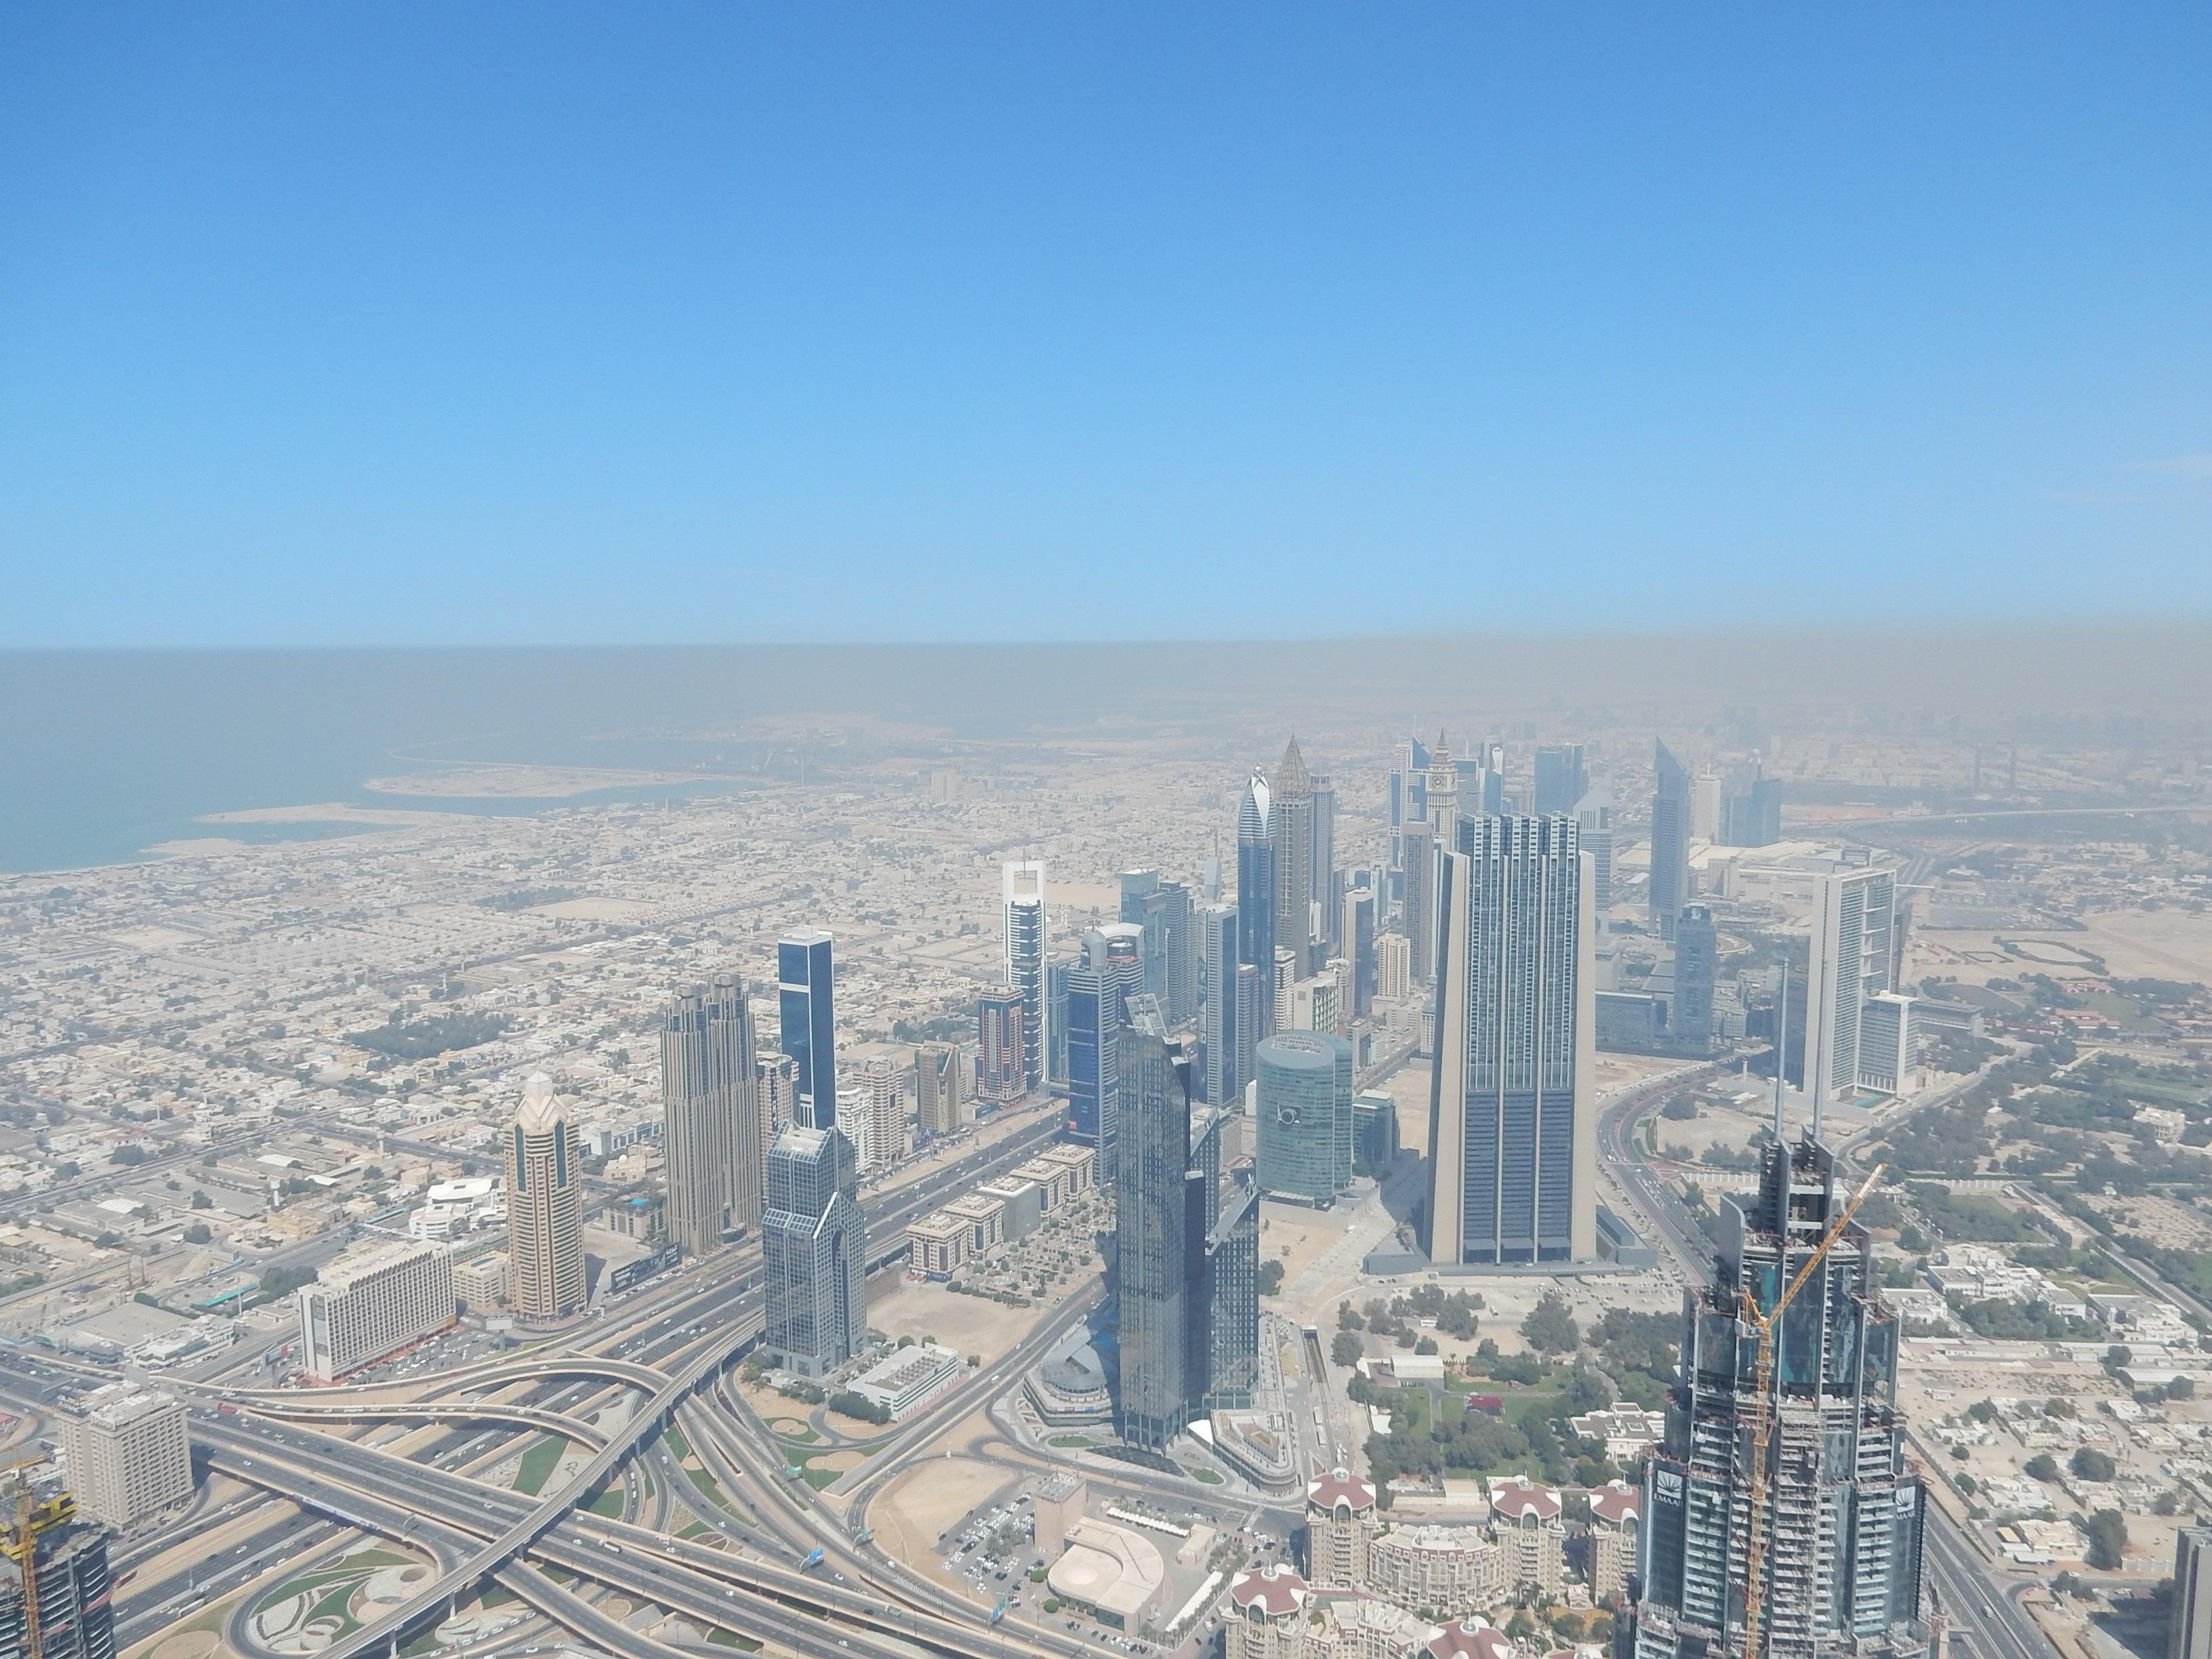 fotos gratis horizonte rascacielos paisaje urbano panorama centro de la ciudad torre dubai punto de referencia bloque de pisos